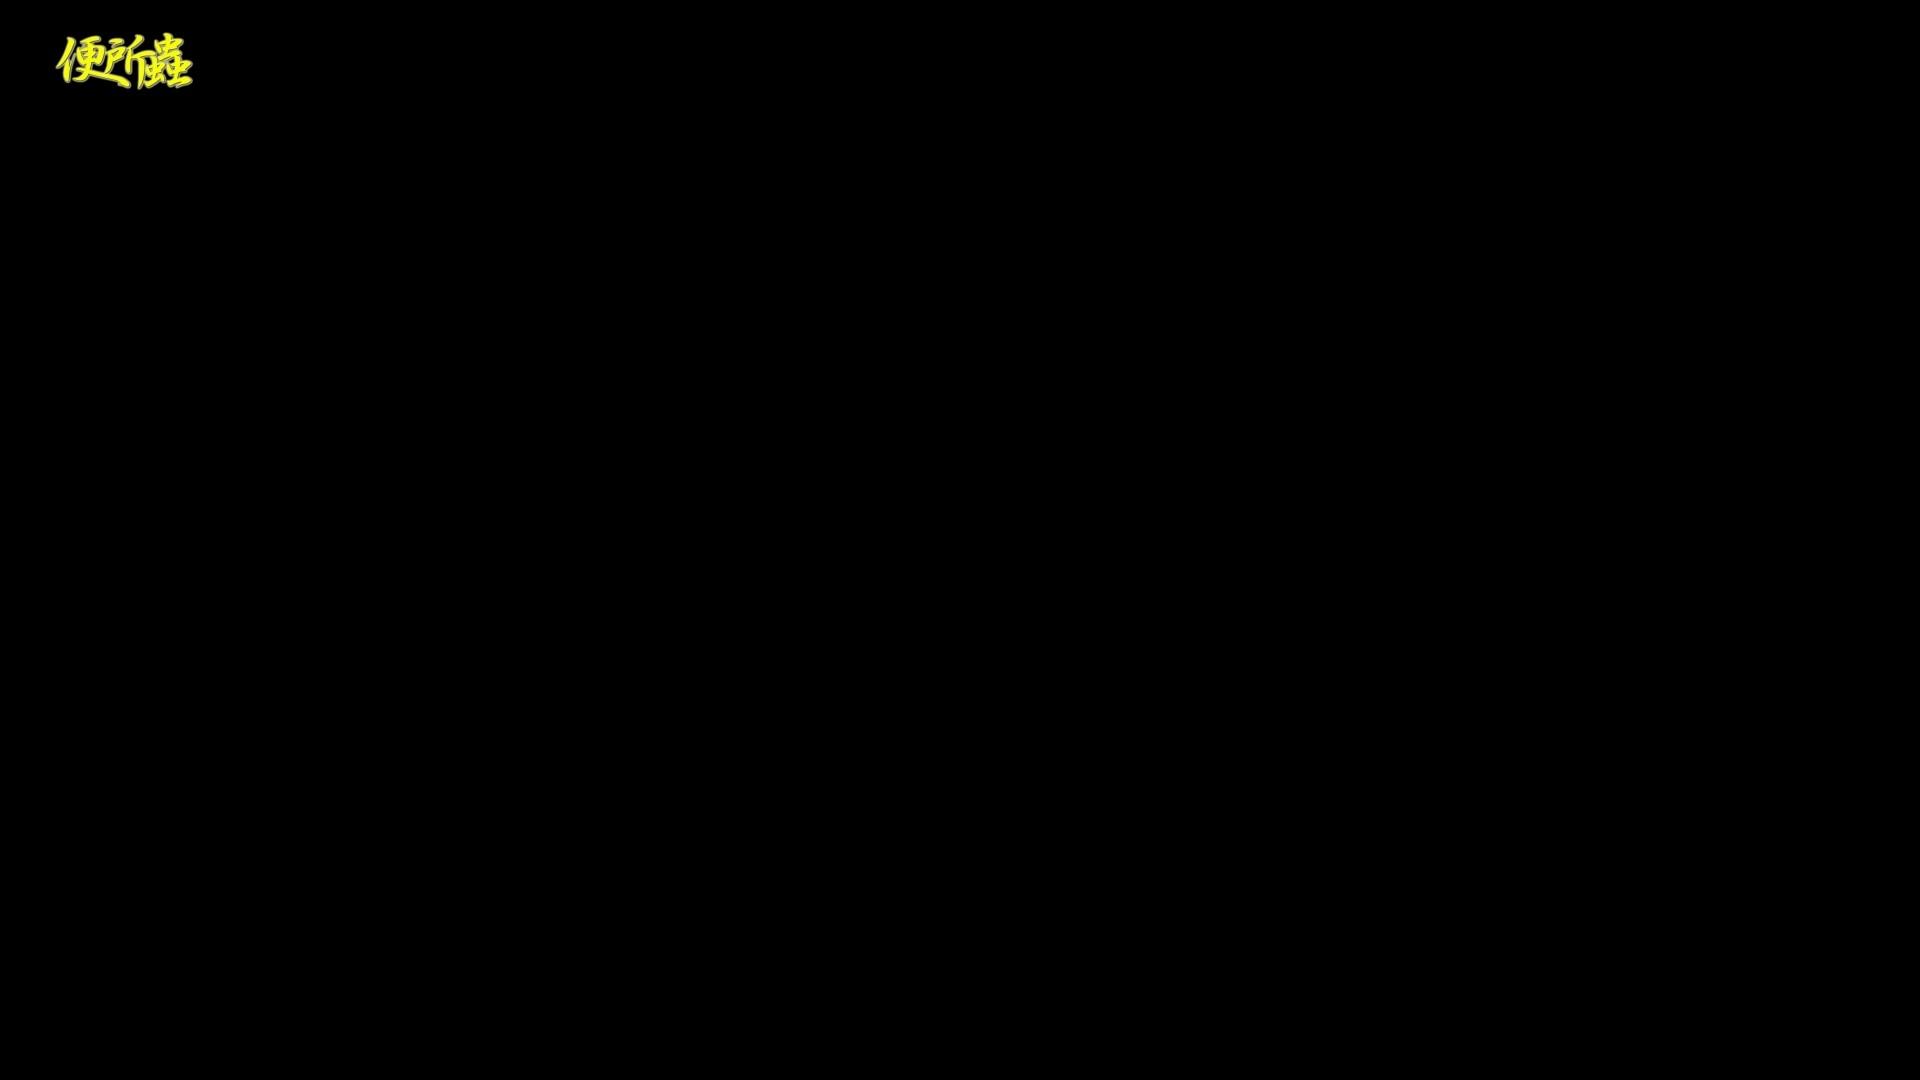 vol.08 便所蟲さんのリターン~寺子屋洗面所盗撮~ 便所 ワレメ無修正動画無料 94画像 62